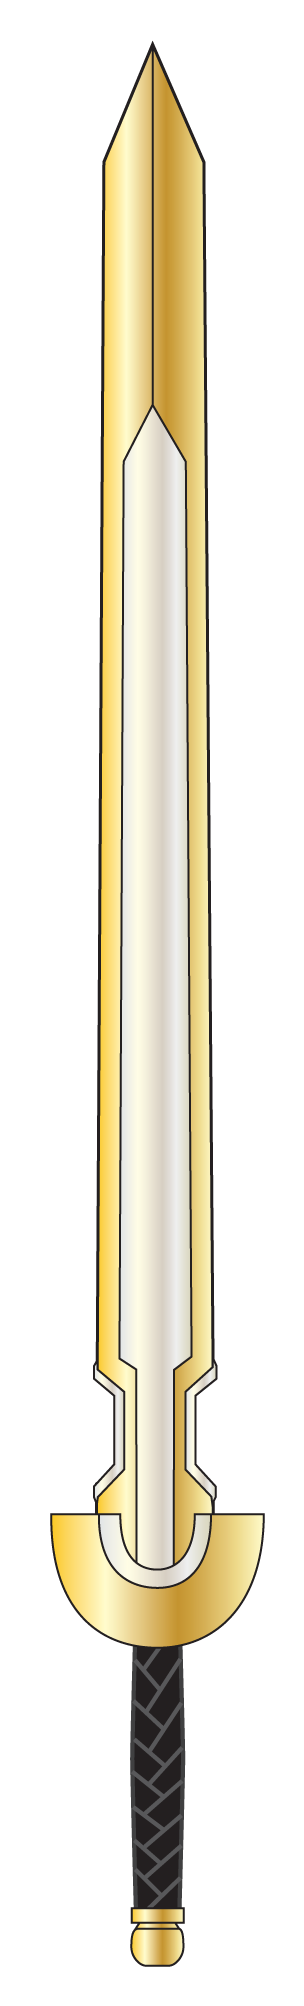 Gilded Sun Blade by GnarledContradiction